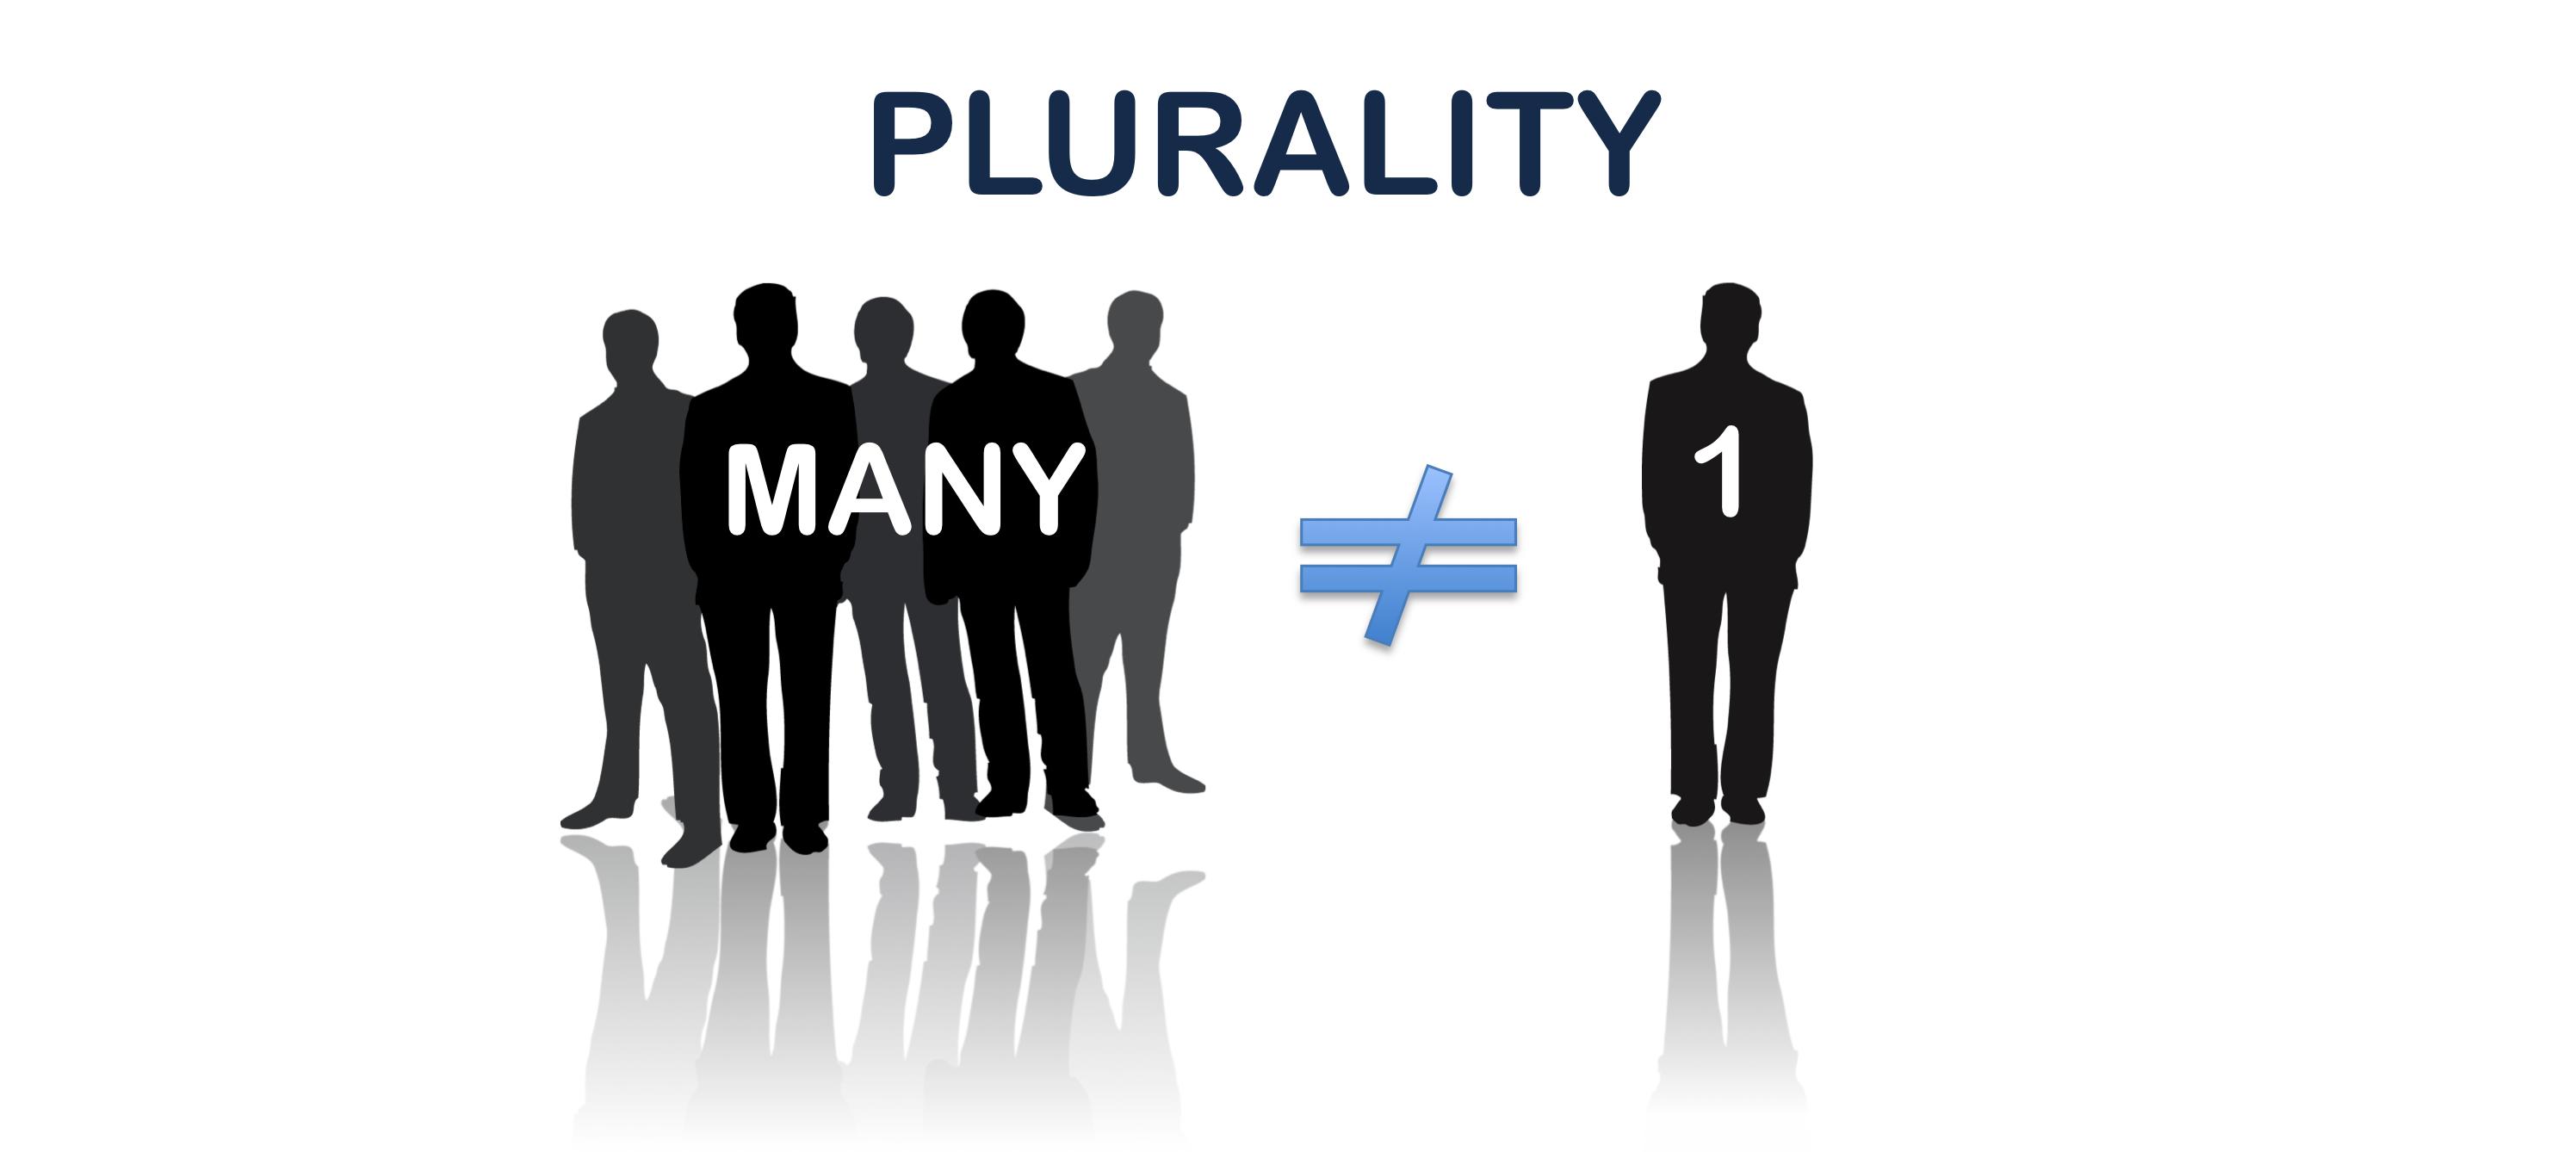 Plurality illustration.